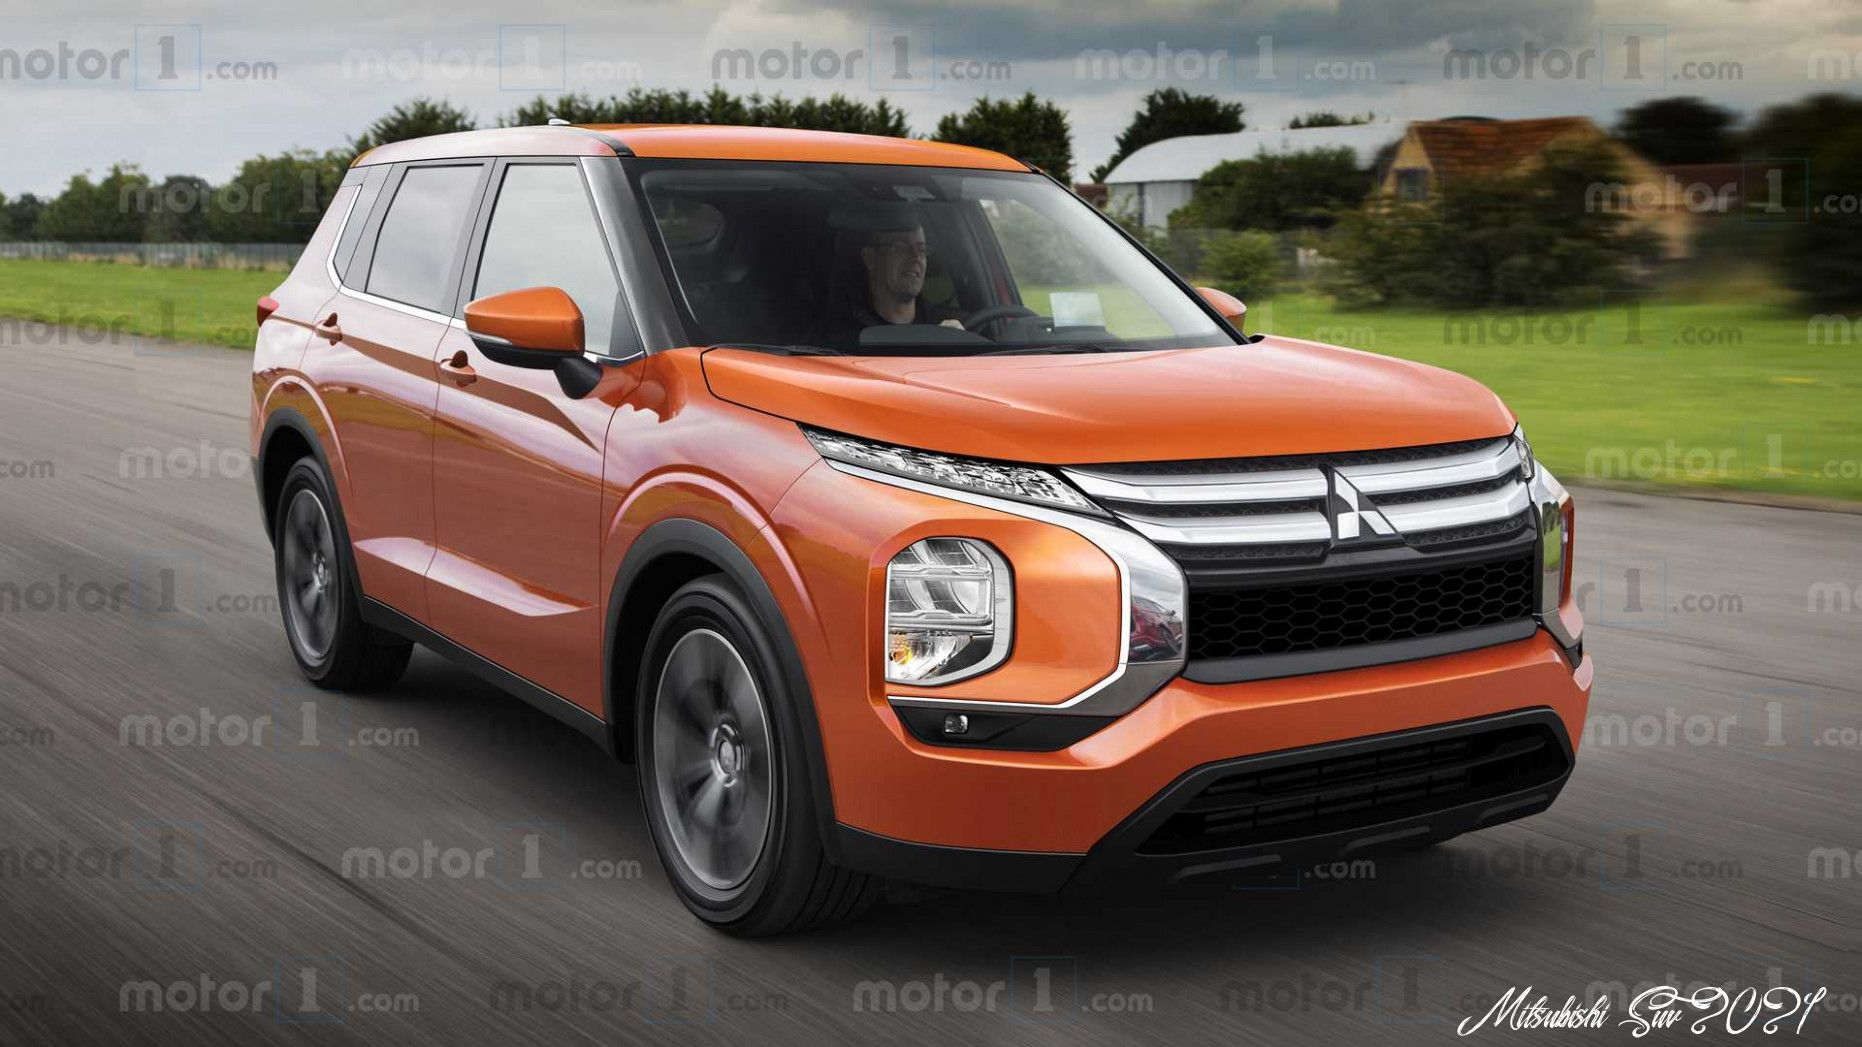 Mitsubishi Suv 2021 Price And Review in 2020 Mitsubishi